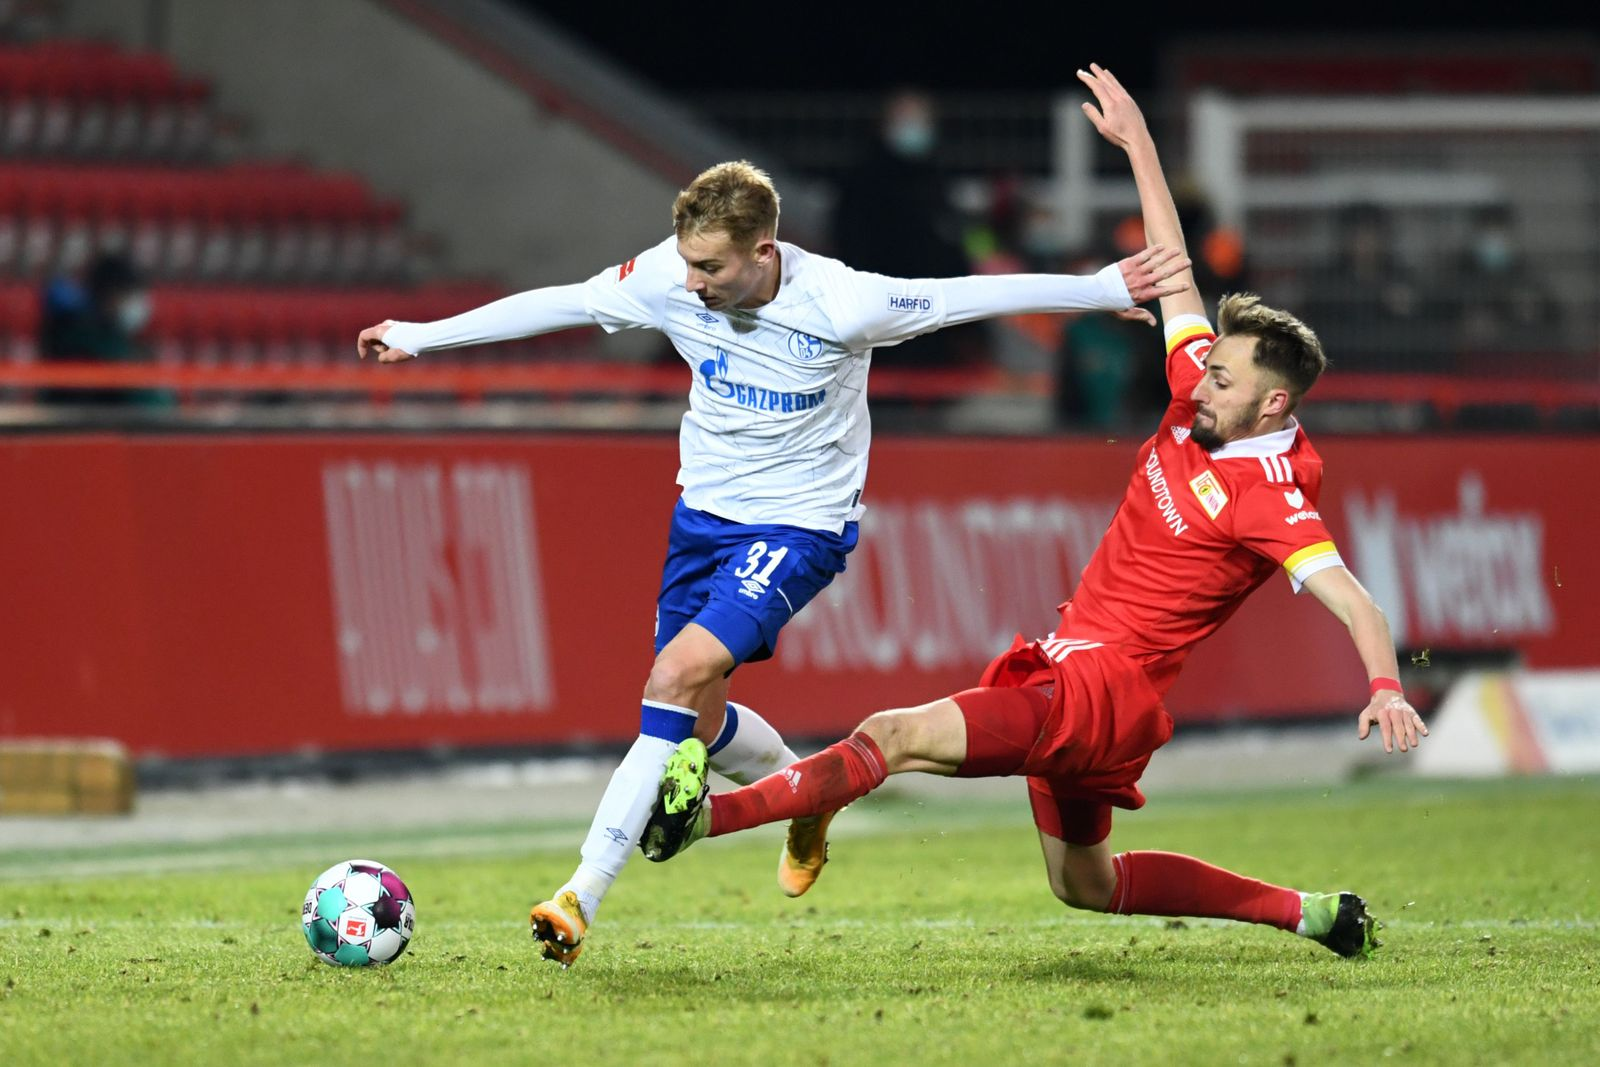 Football: Bundesliga - day 21: 1. FC Union Berlin v Schalke 04